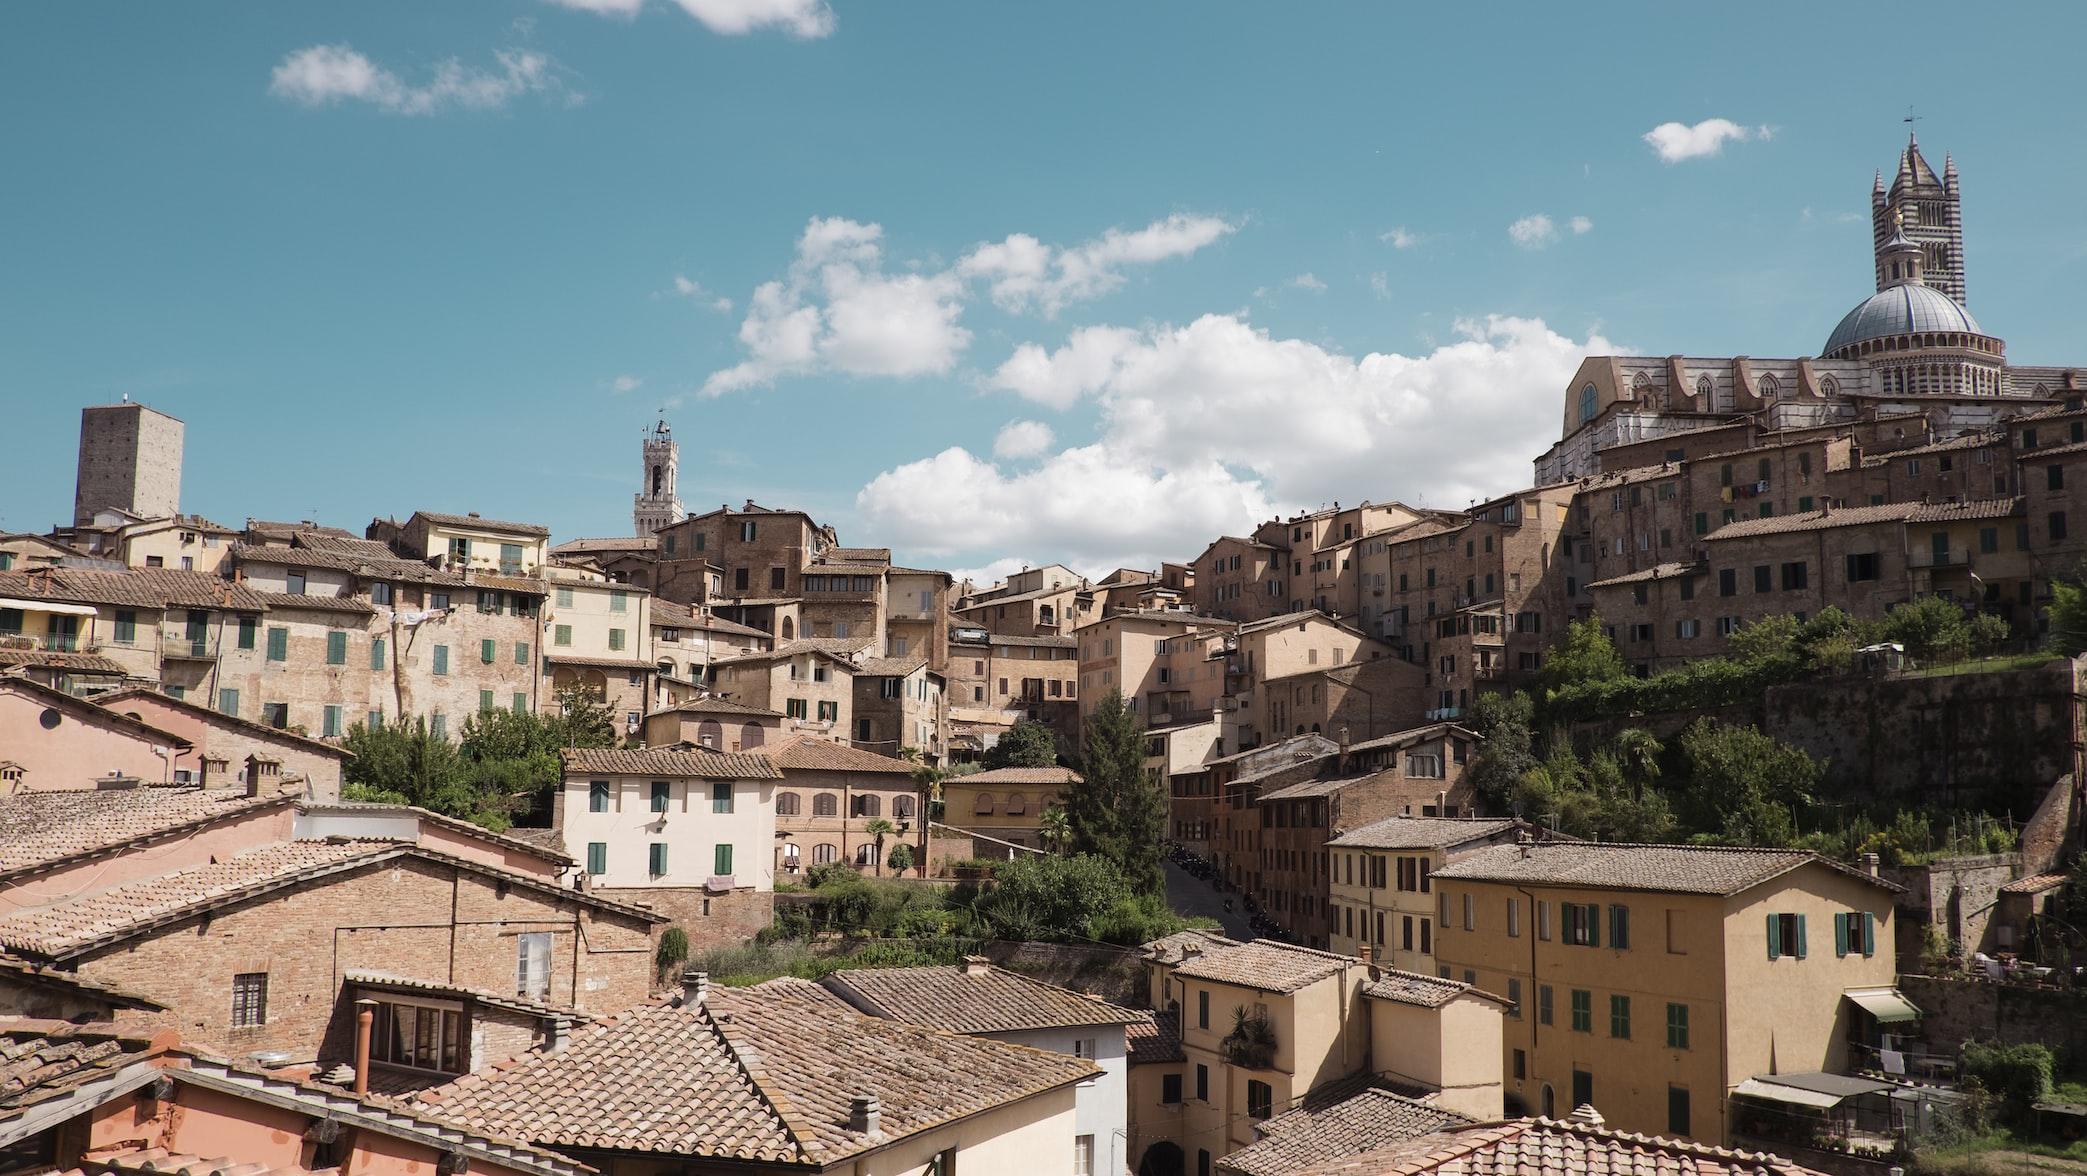 skyline of Siena, Italy